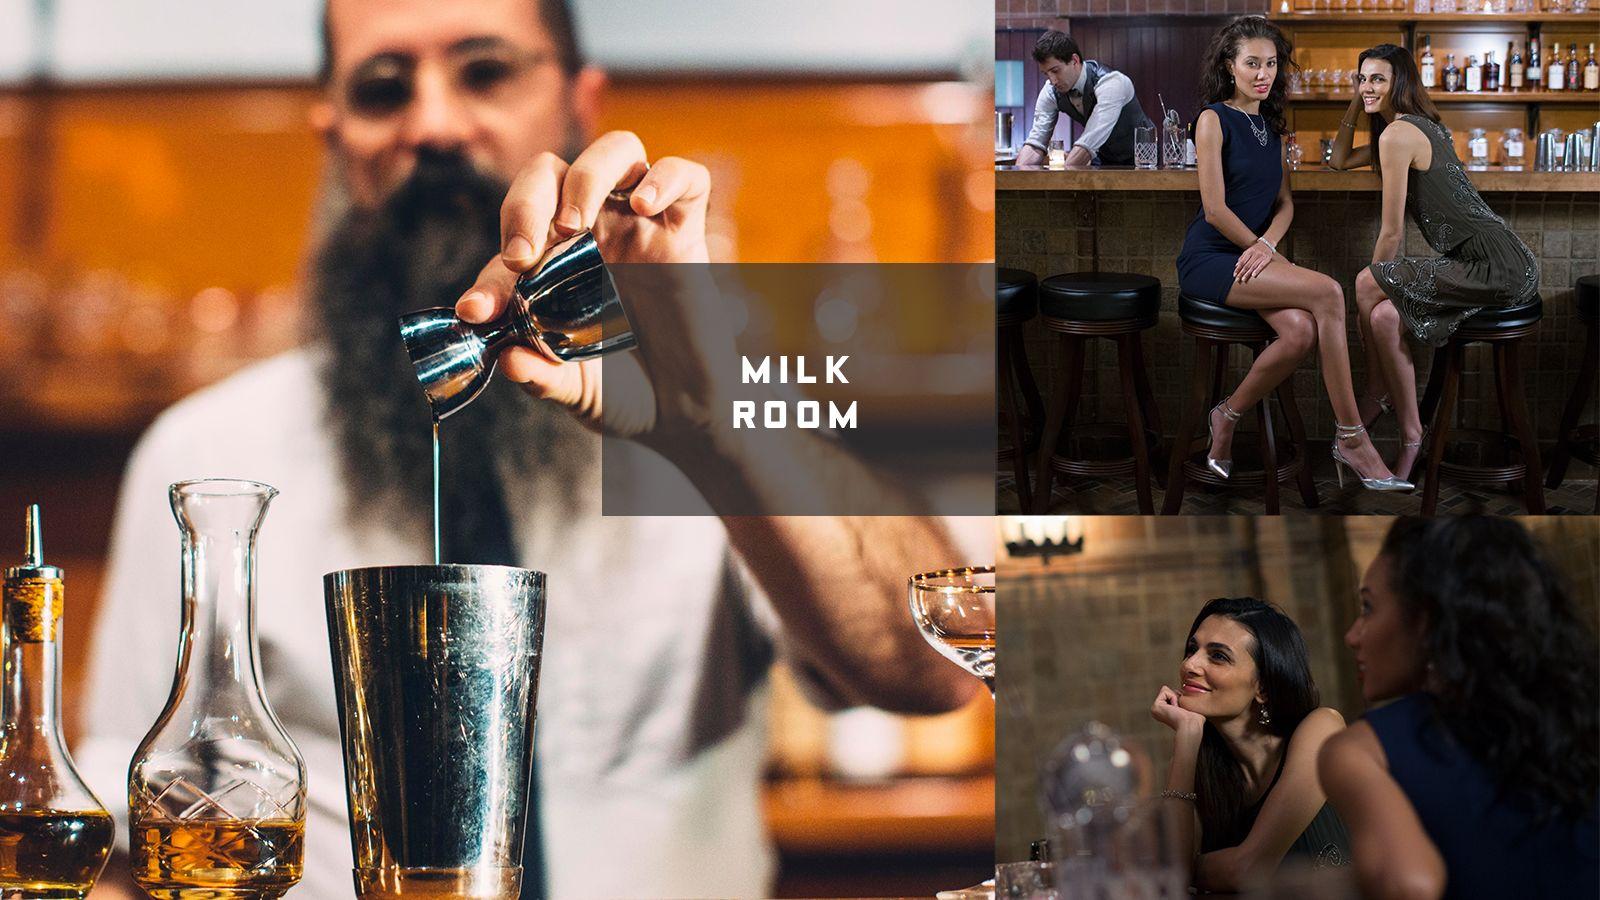 Milk Room